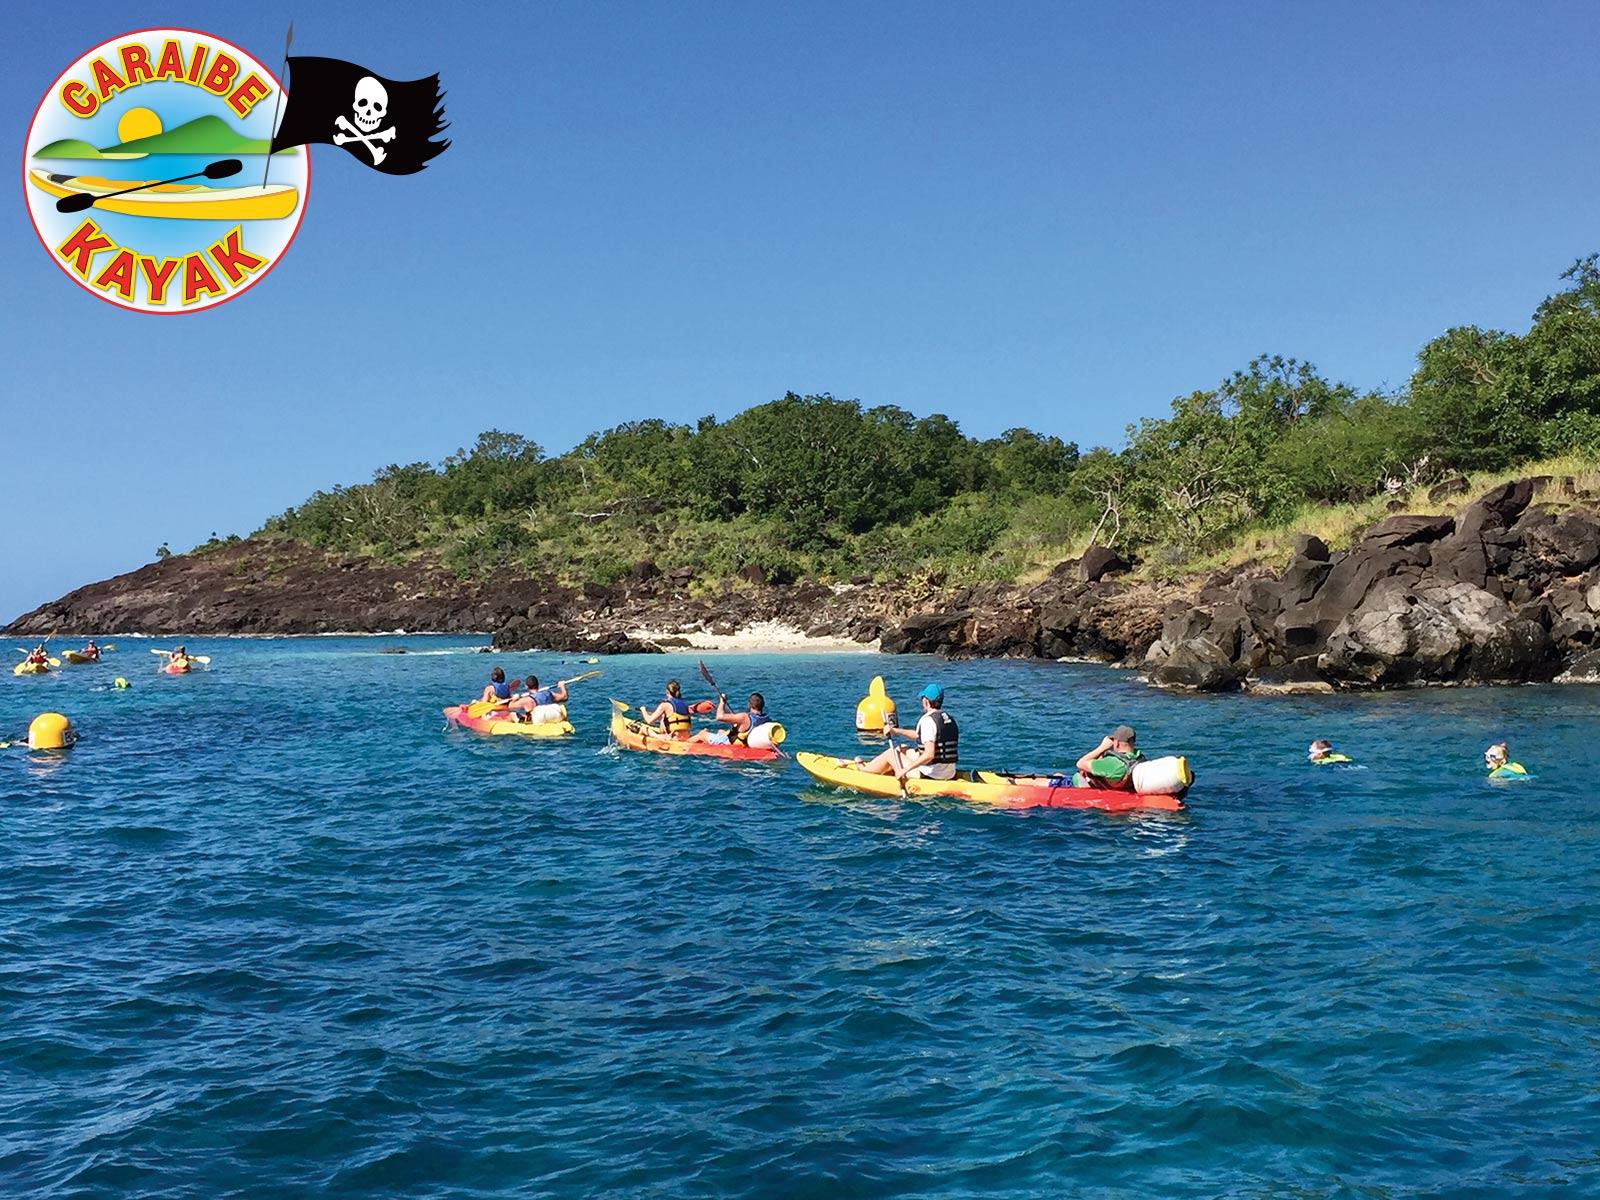 Caraïbe Kayak - kayak libre aux Ilets Pigeon